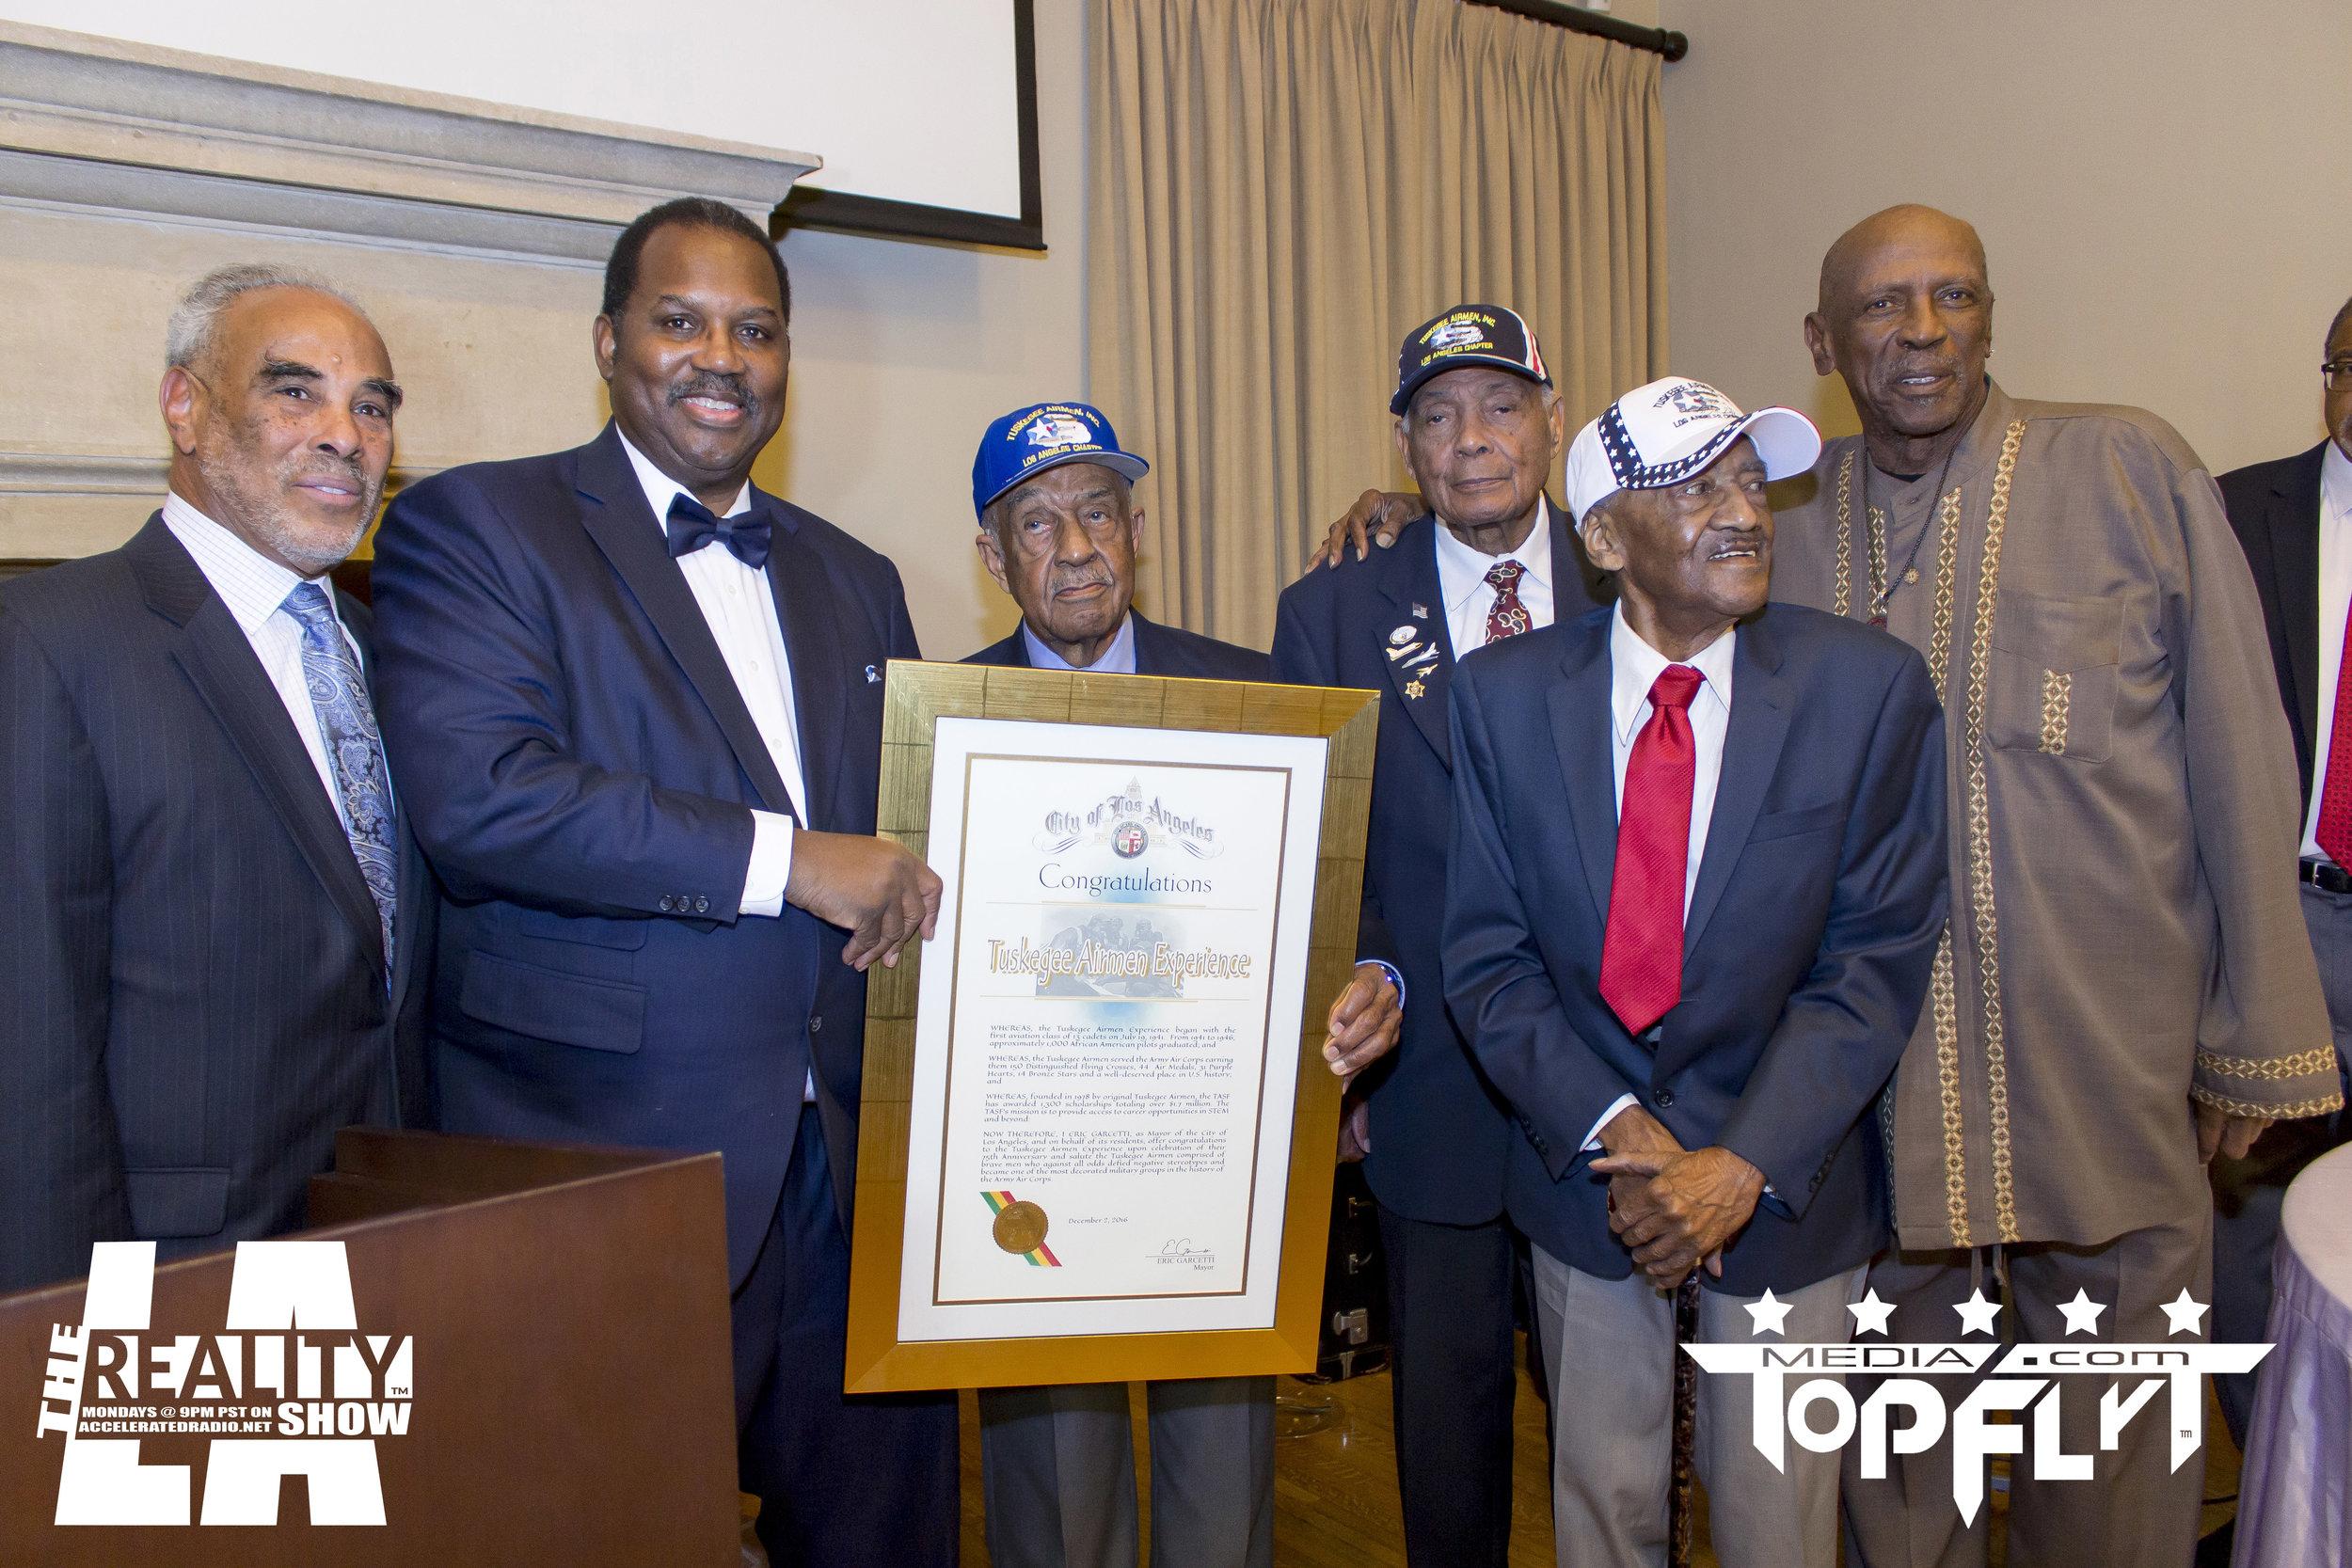 The Reality Show LA - Tuskegee Airmen 75th Anniversary VIP Reception_126.jpg